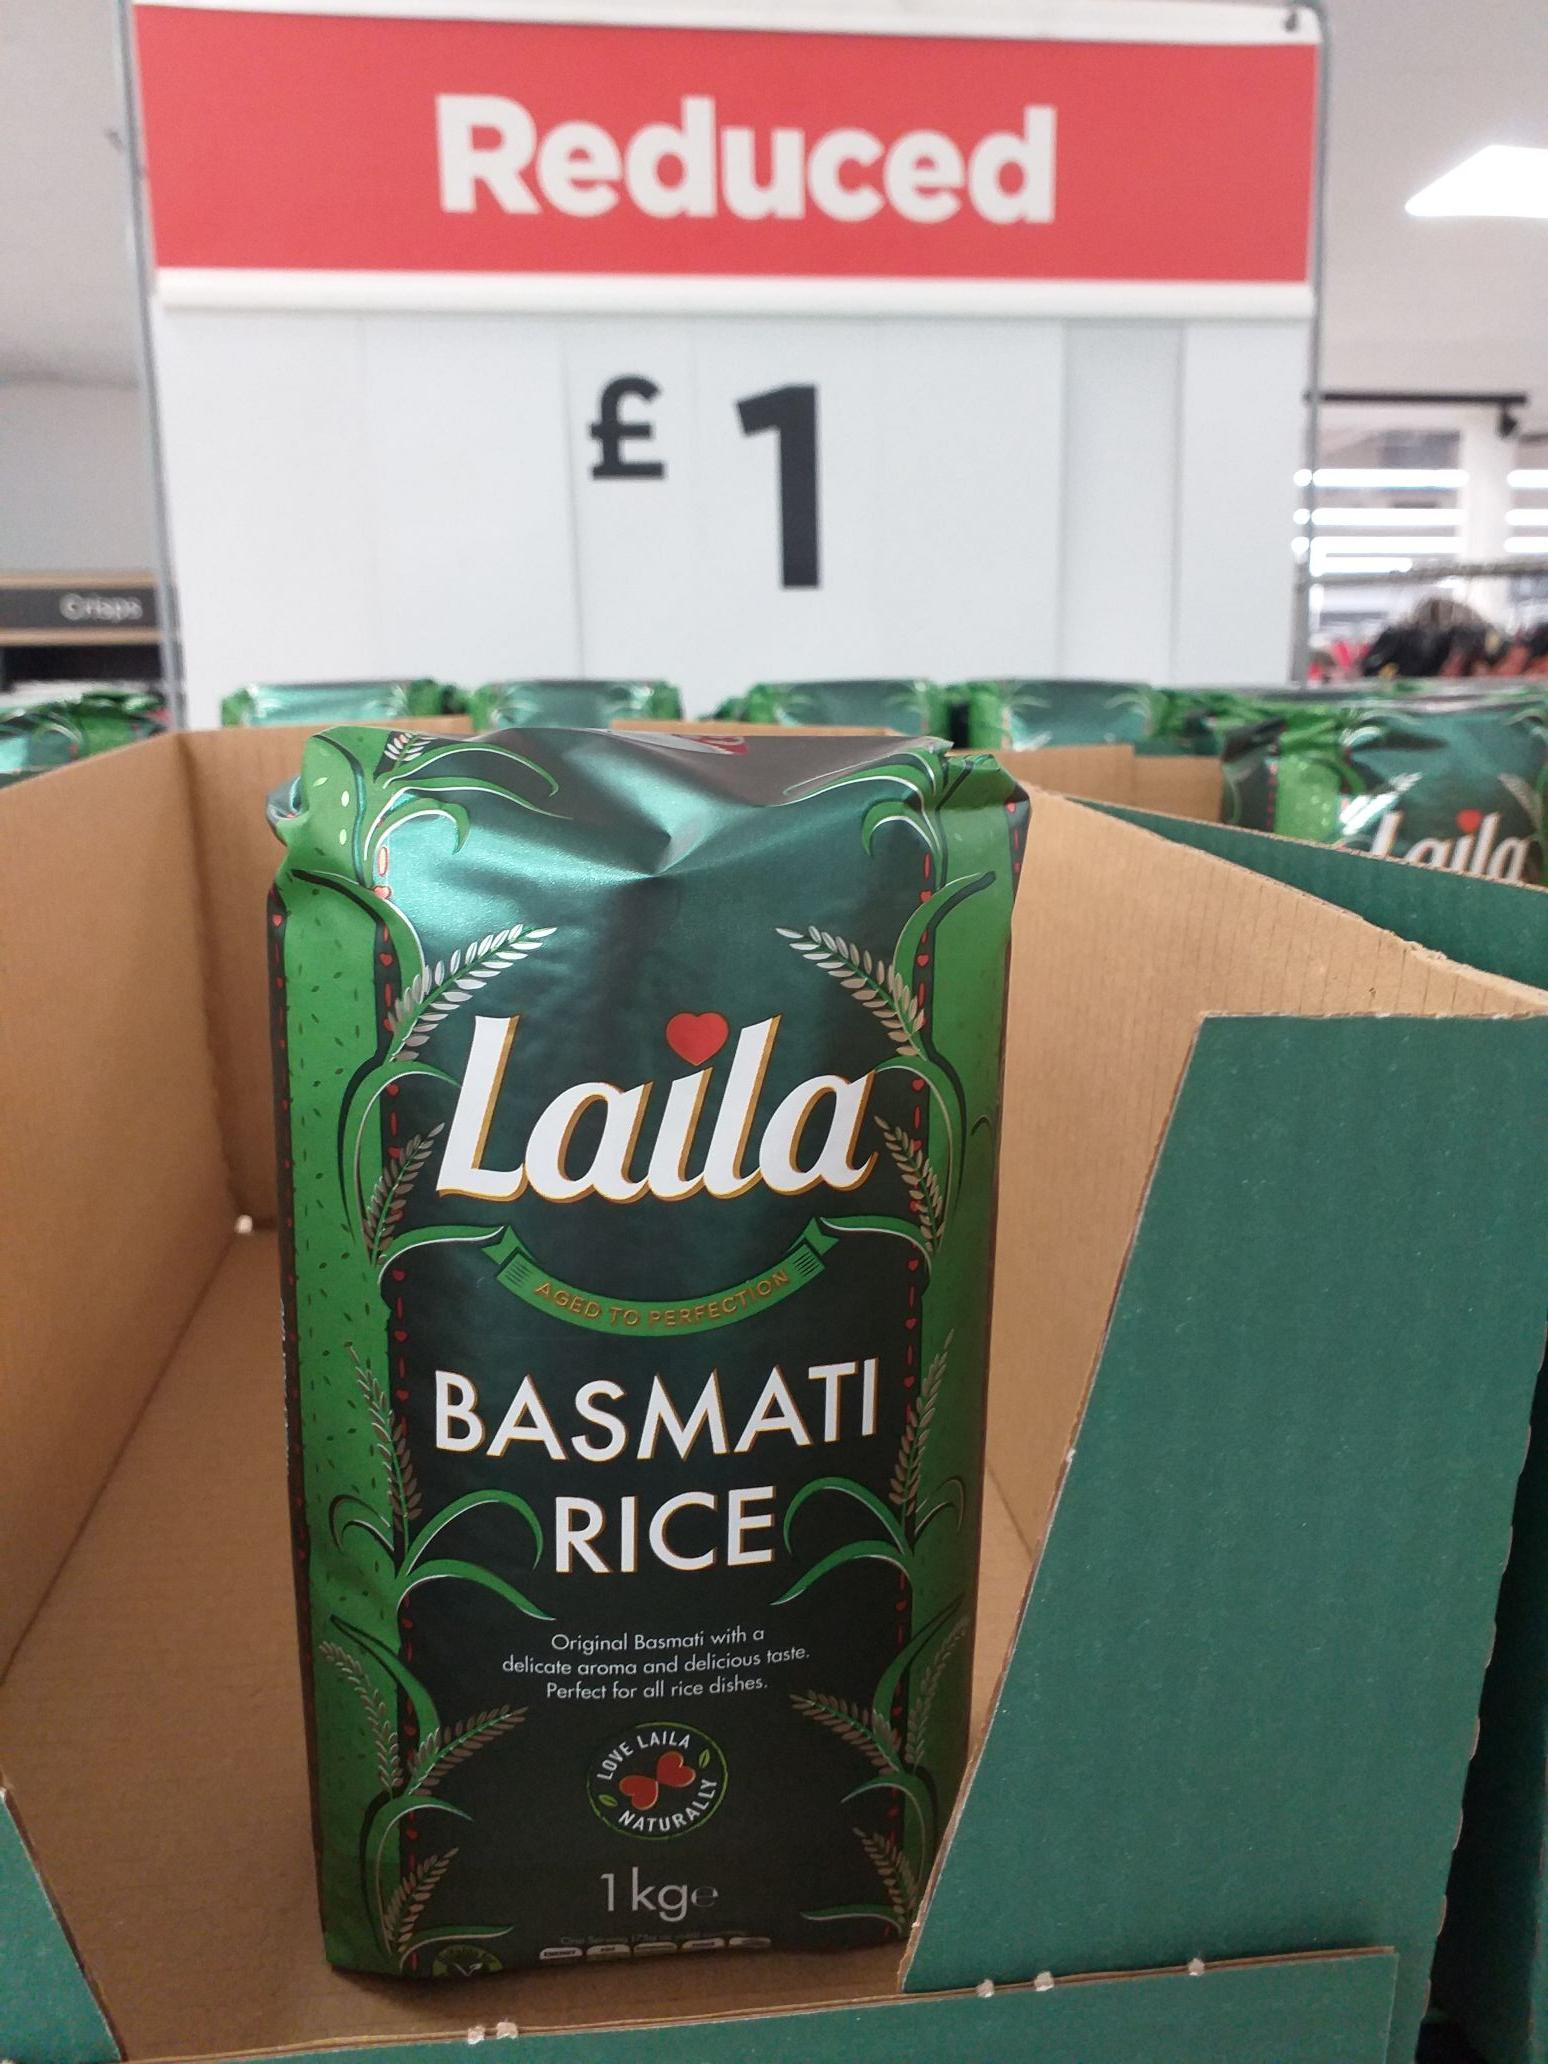 Laila original basmati rice 1kg £1 instore @ Asda (Preston)